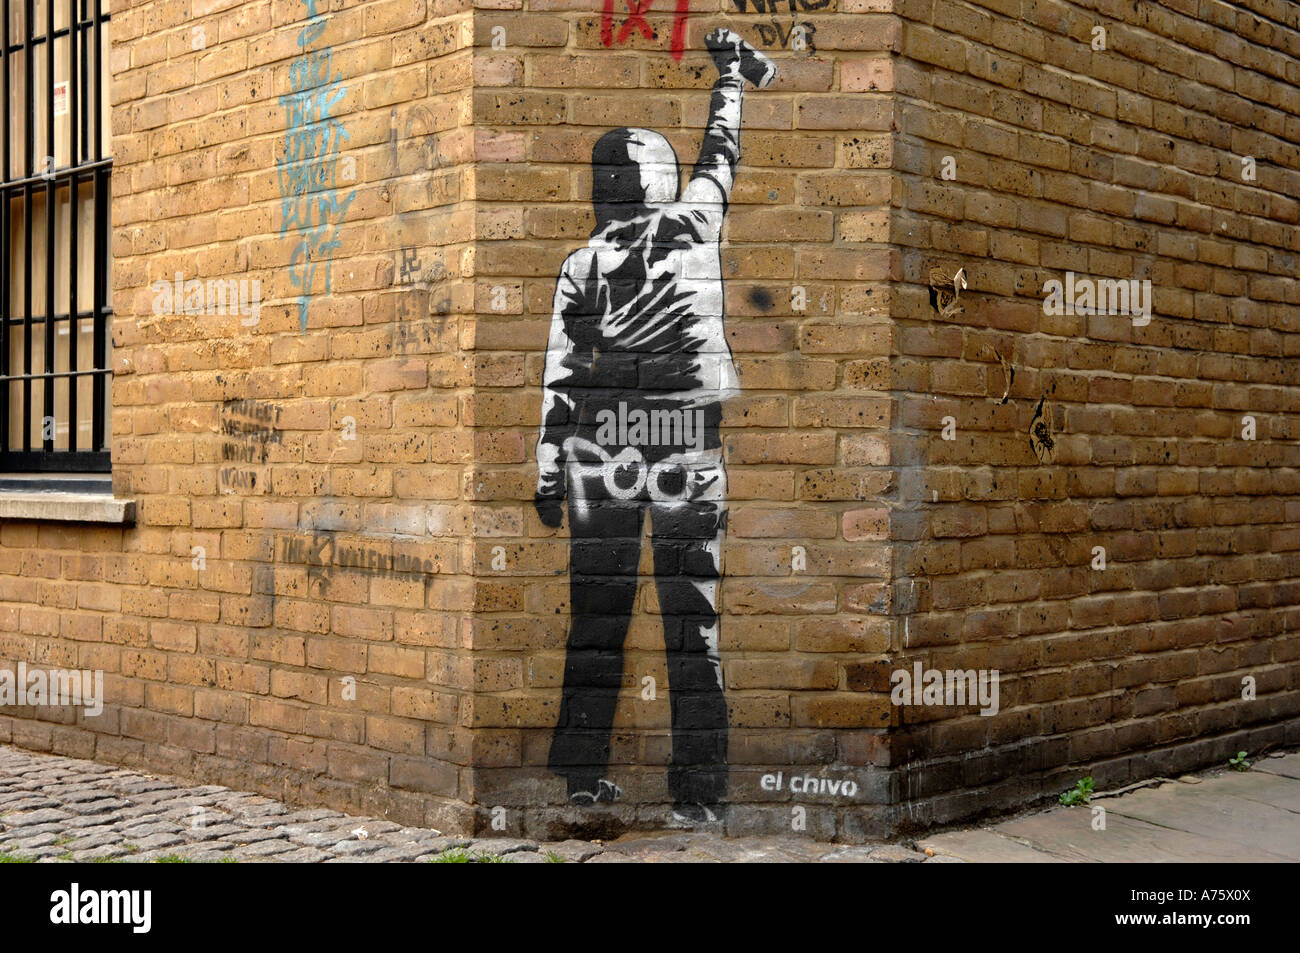 El Chive Graffiti Artist Banksy Style